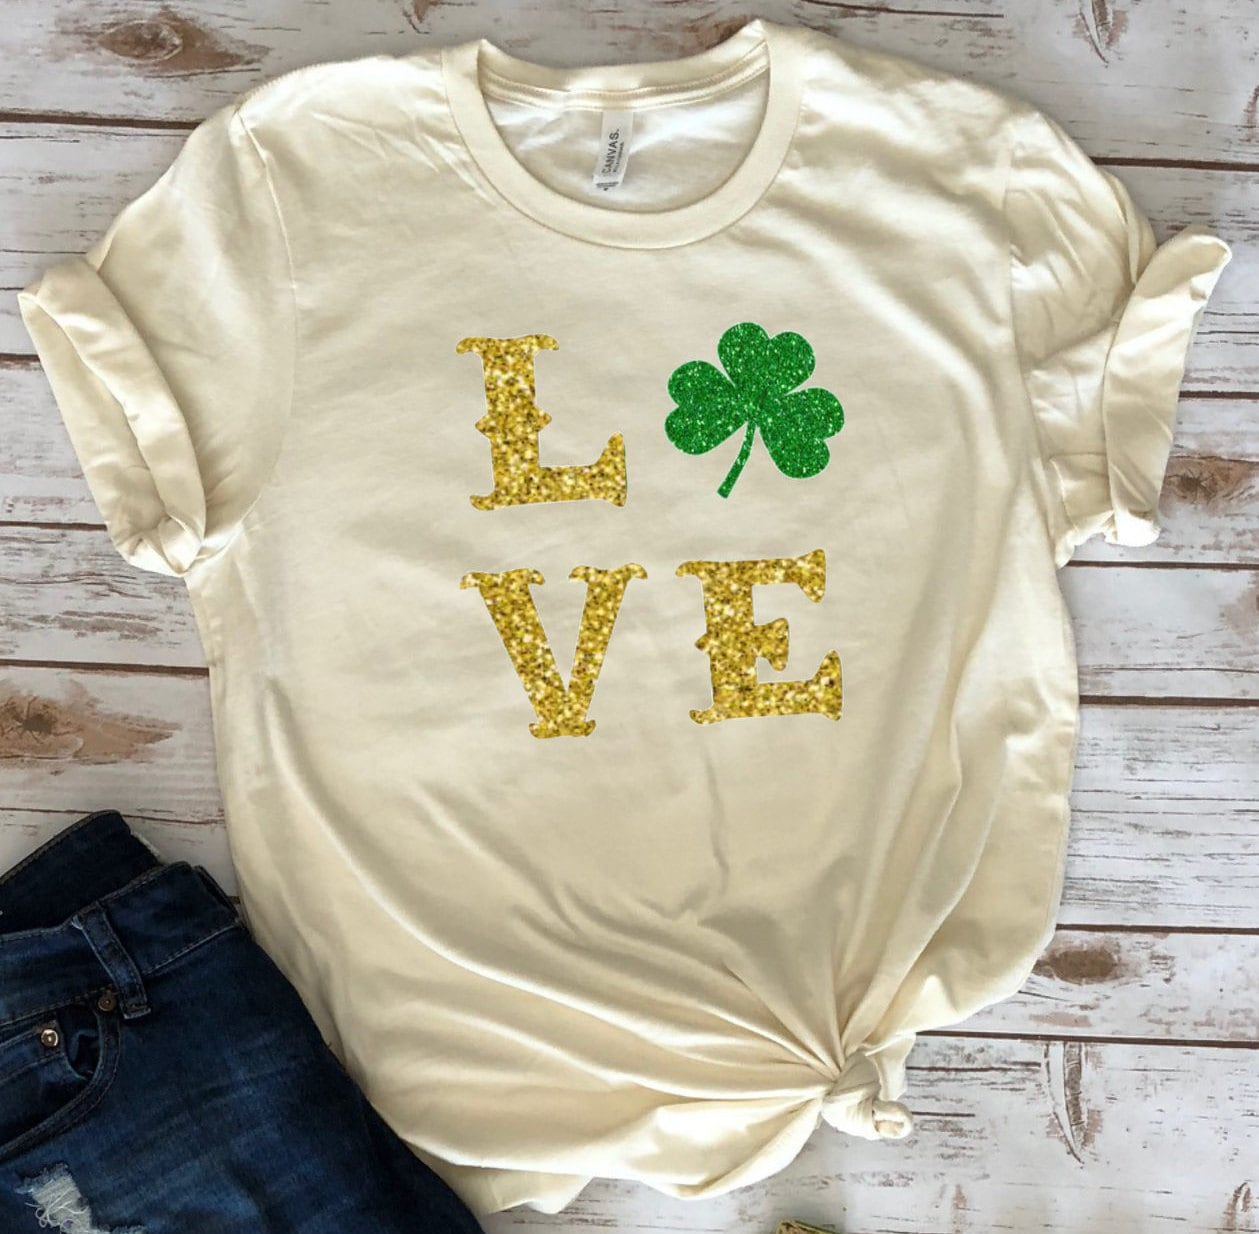 be6660a39ddf St Patricks Day Glitter tshirt, Womens St Patricks Day Tshirt , Womens St  Pattys Day Shirt, St Packtricks Day shirt Women, Shamrock Shirt